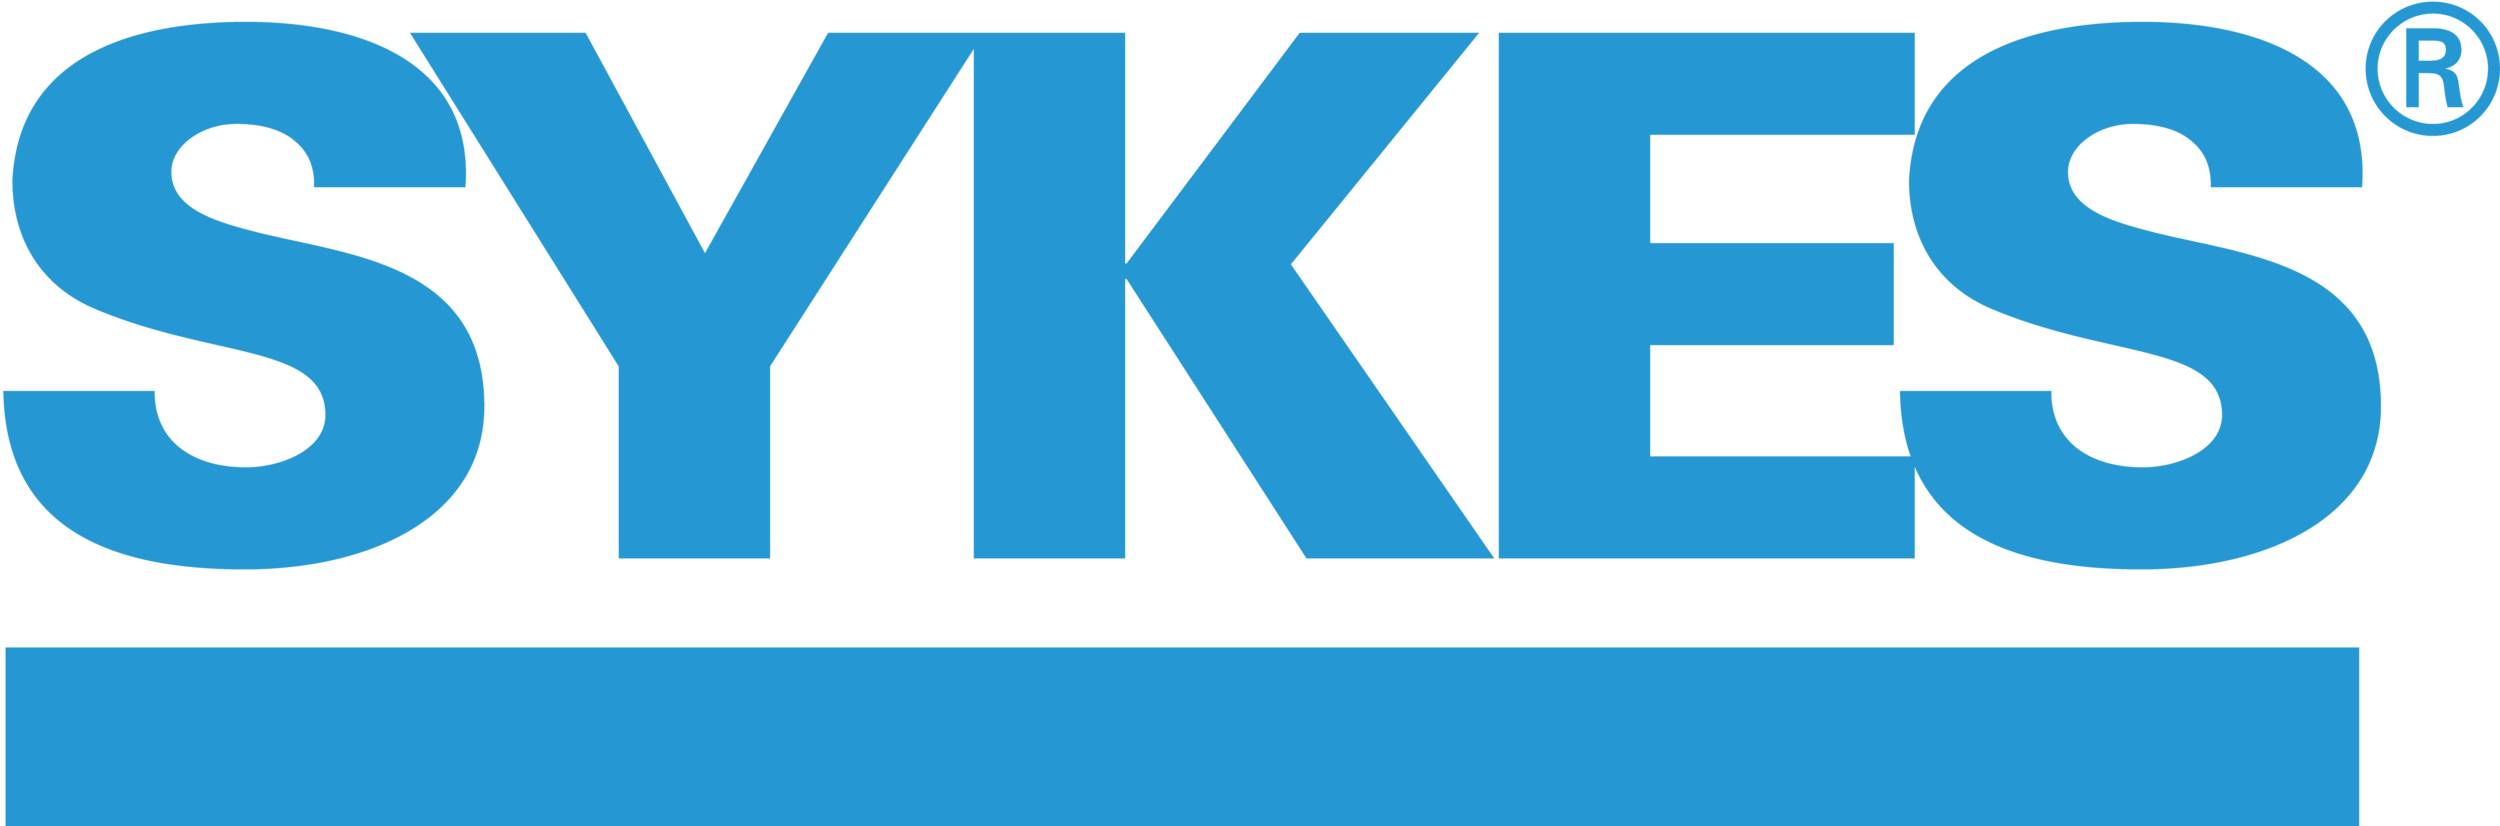 SYKES-Logo-Standard-CMYK-Blue.png